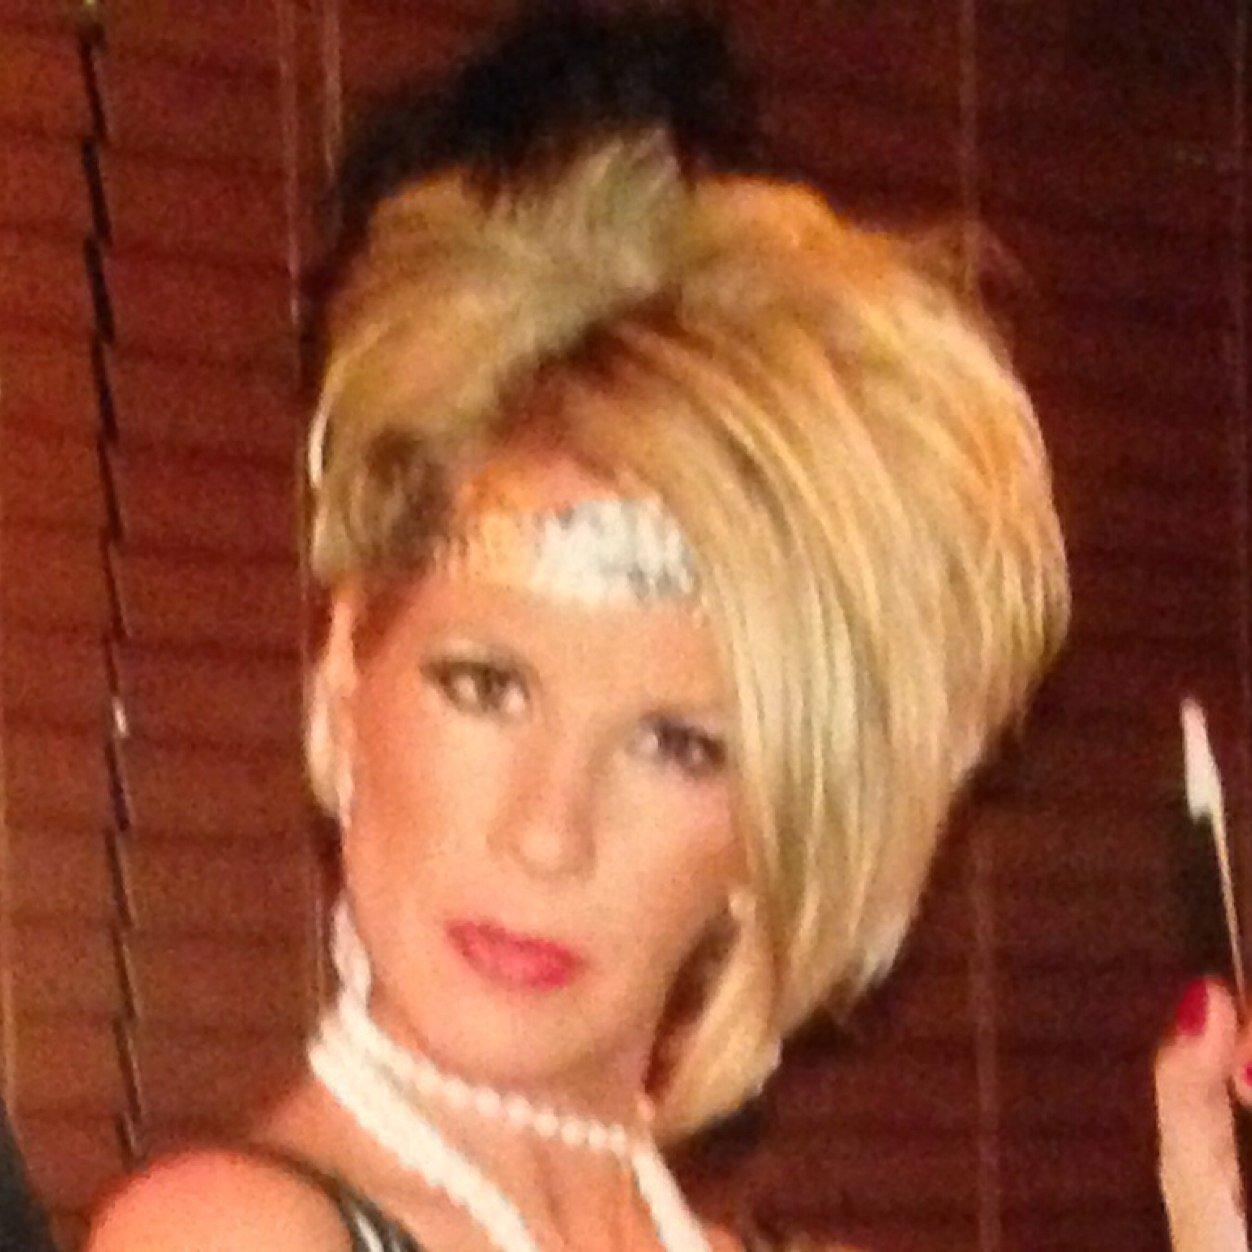 Lauren Diewold,Marjorie Reynolds Adult pic Minta Durfee,Daniela Braga BRA 4 2014?017